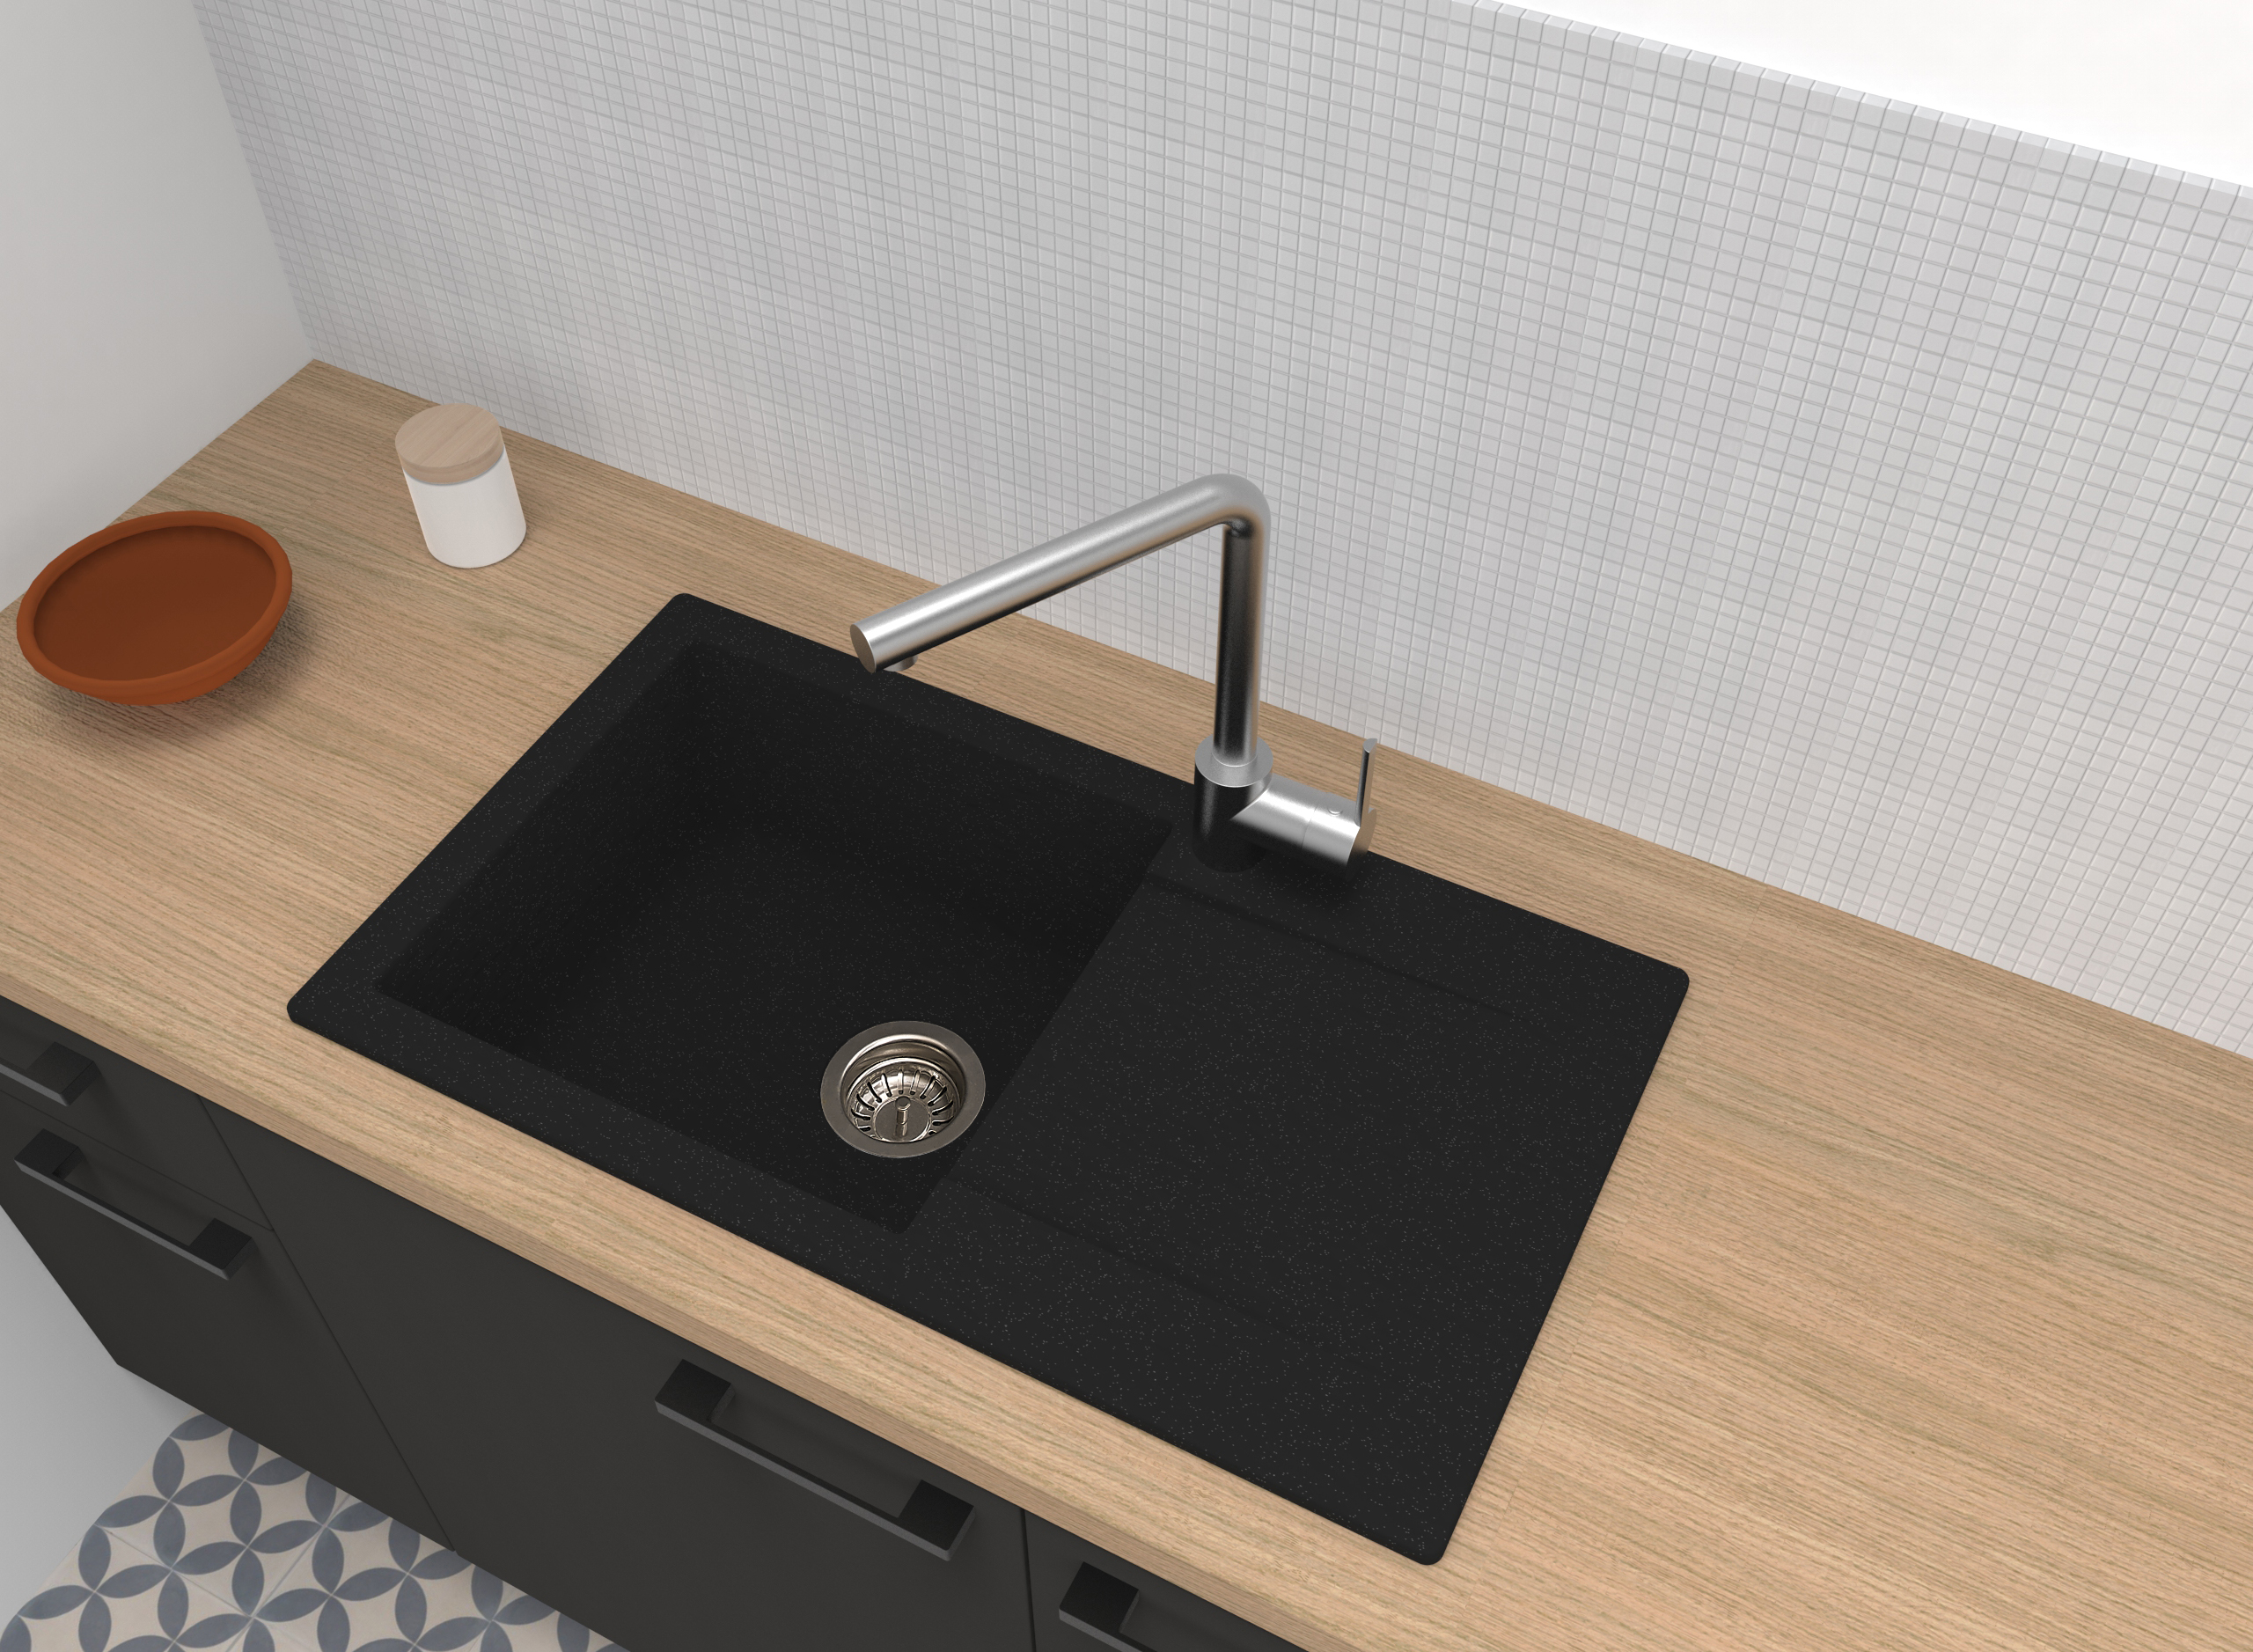 Spüle Küchenspüle Einbauspüle Granitspüle Mineralite 78 x 44 schwarz respekta